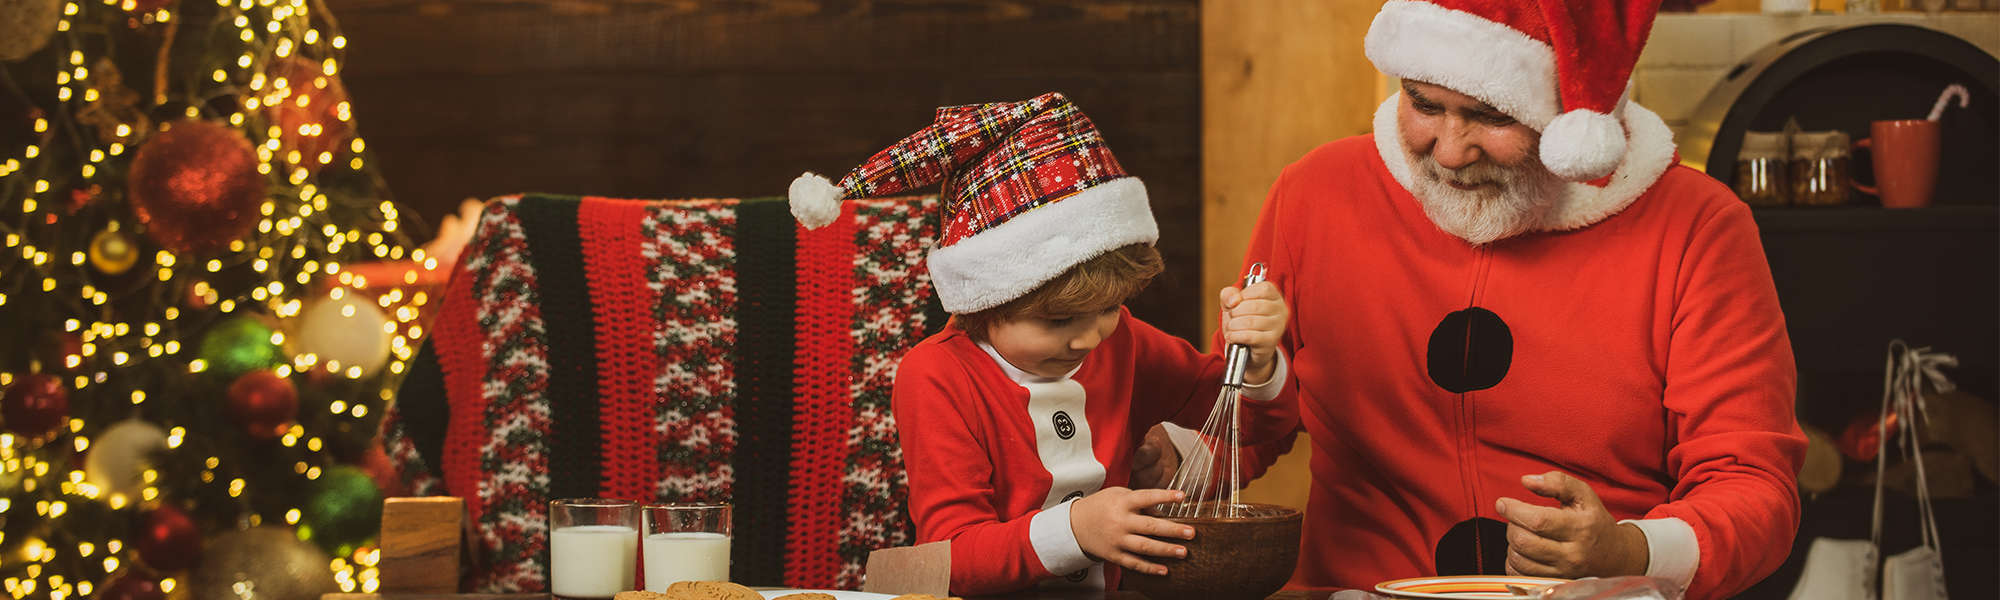 25 Christmas Activities to Help You Get Into The Christmas Spirit